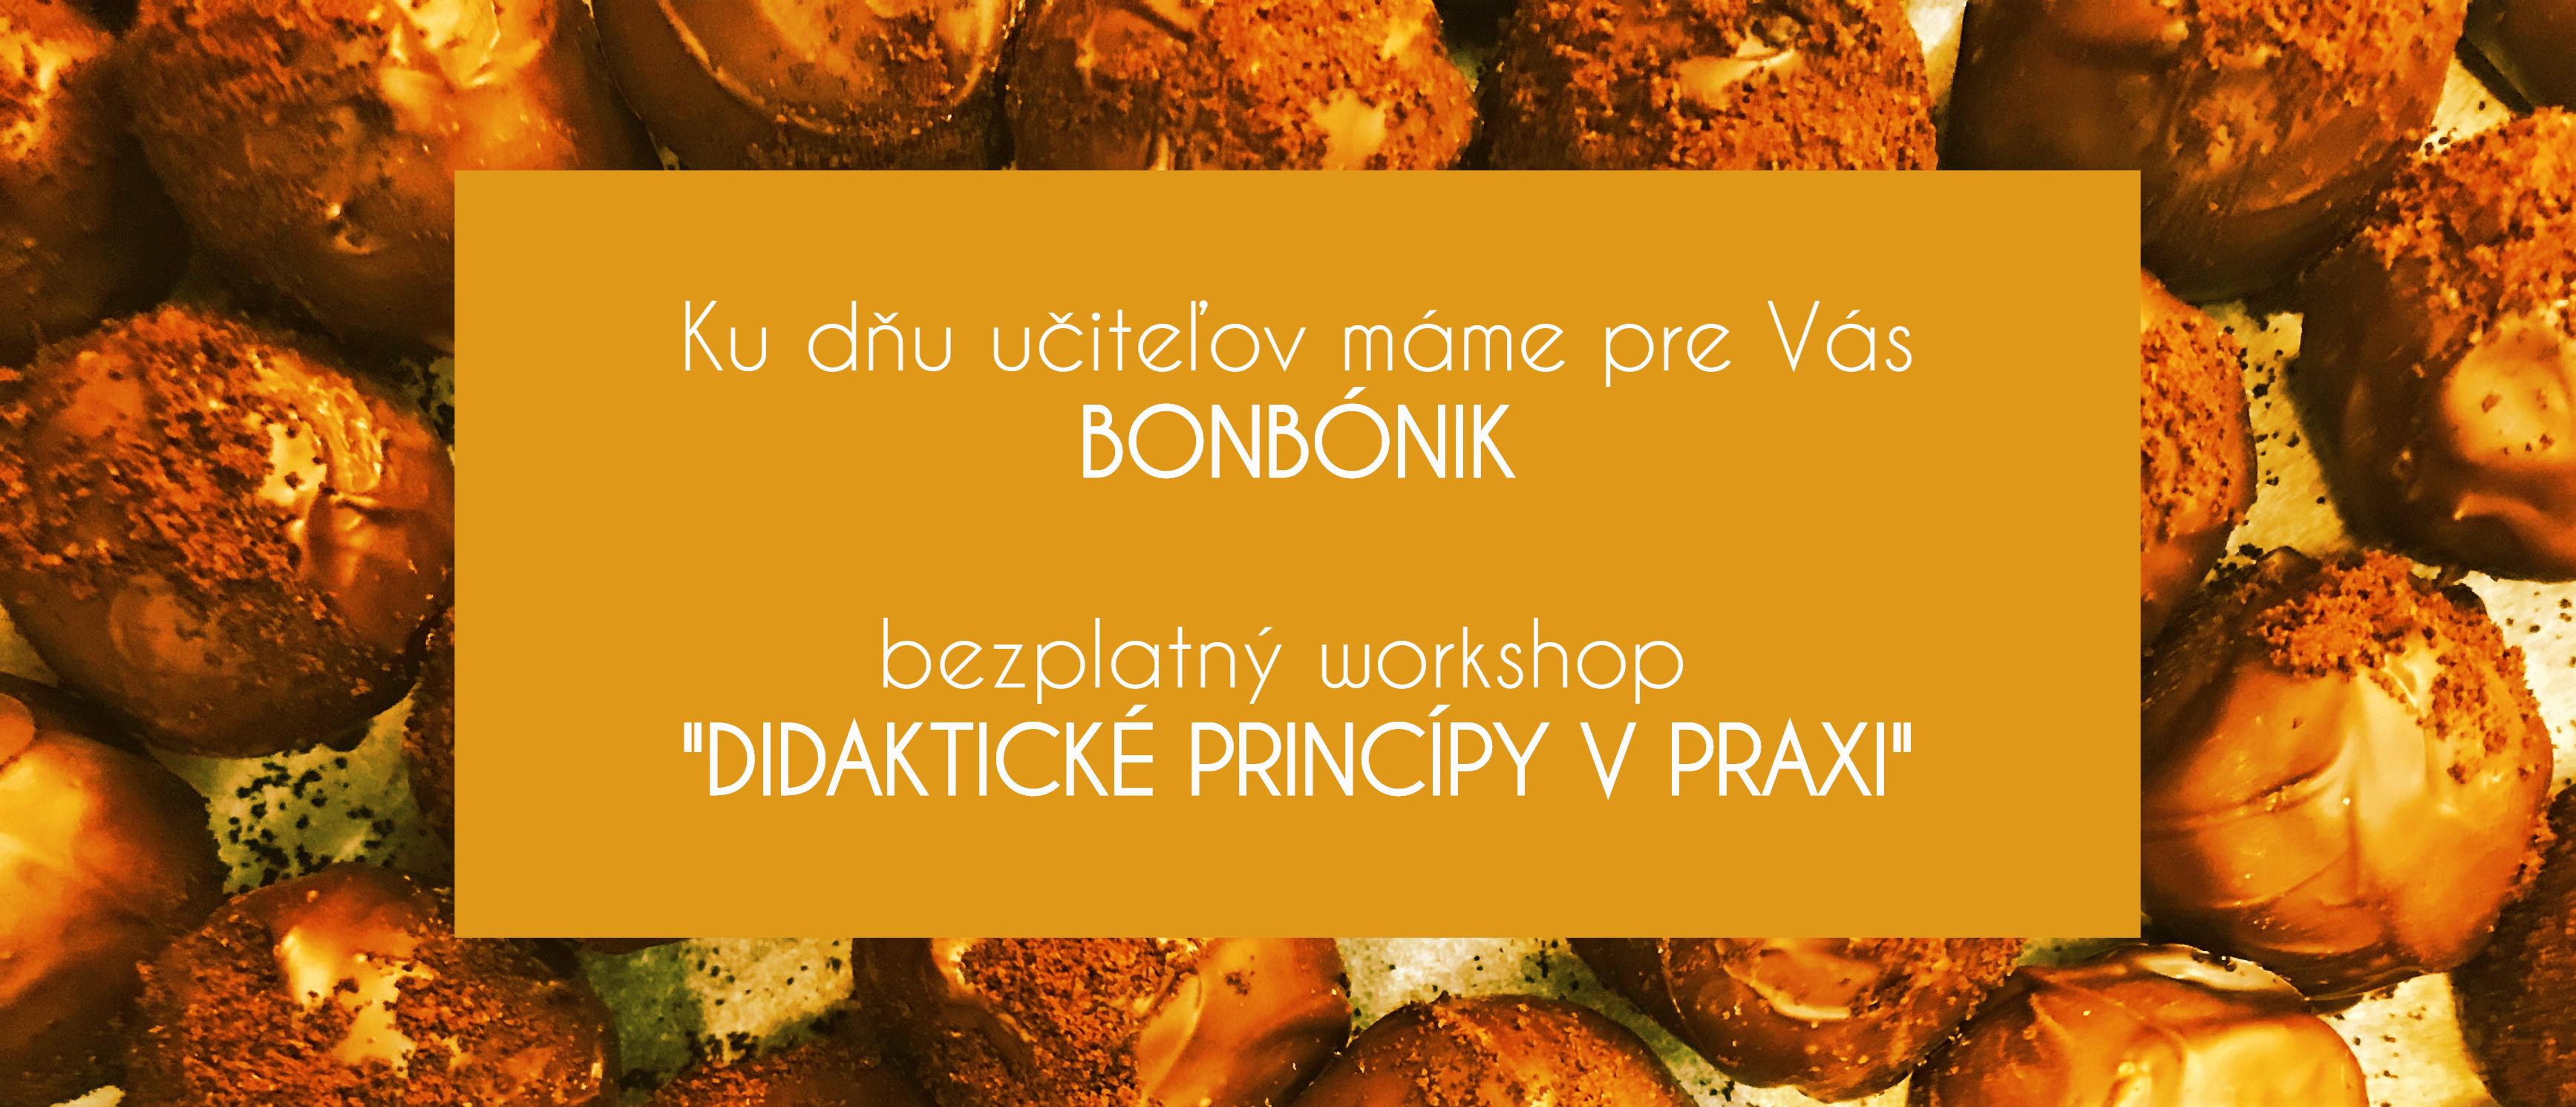 Didakticke_principy_workshop